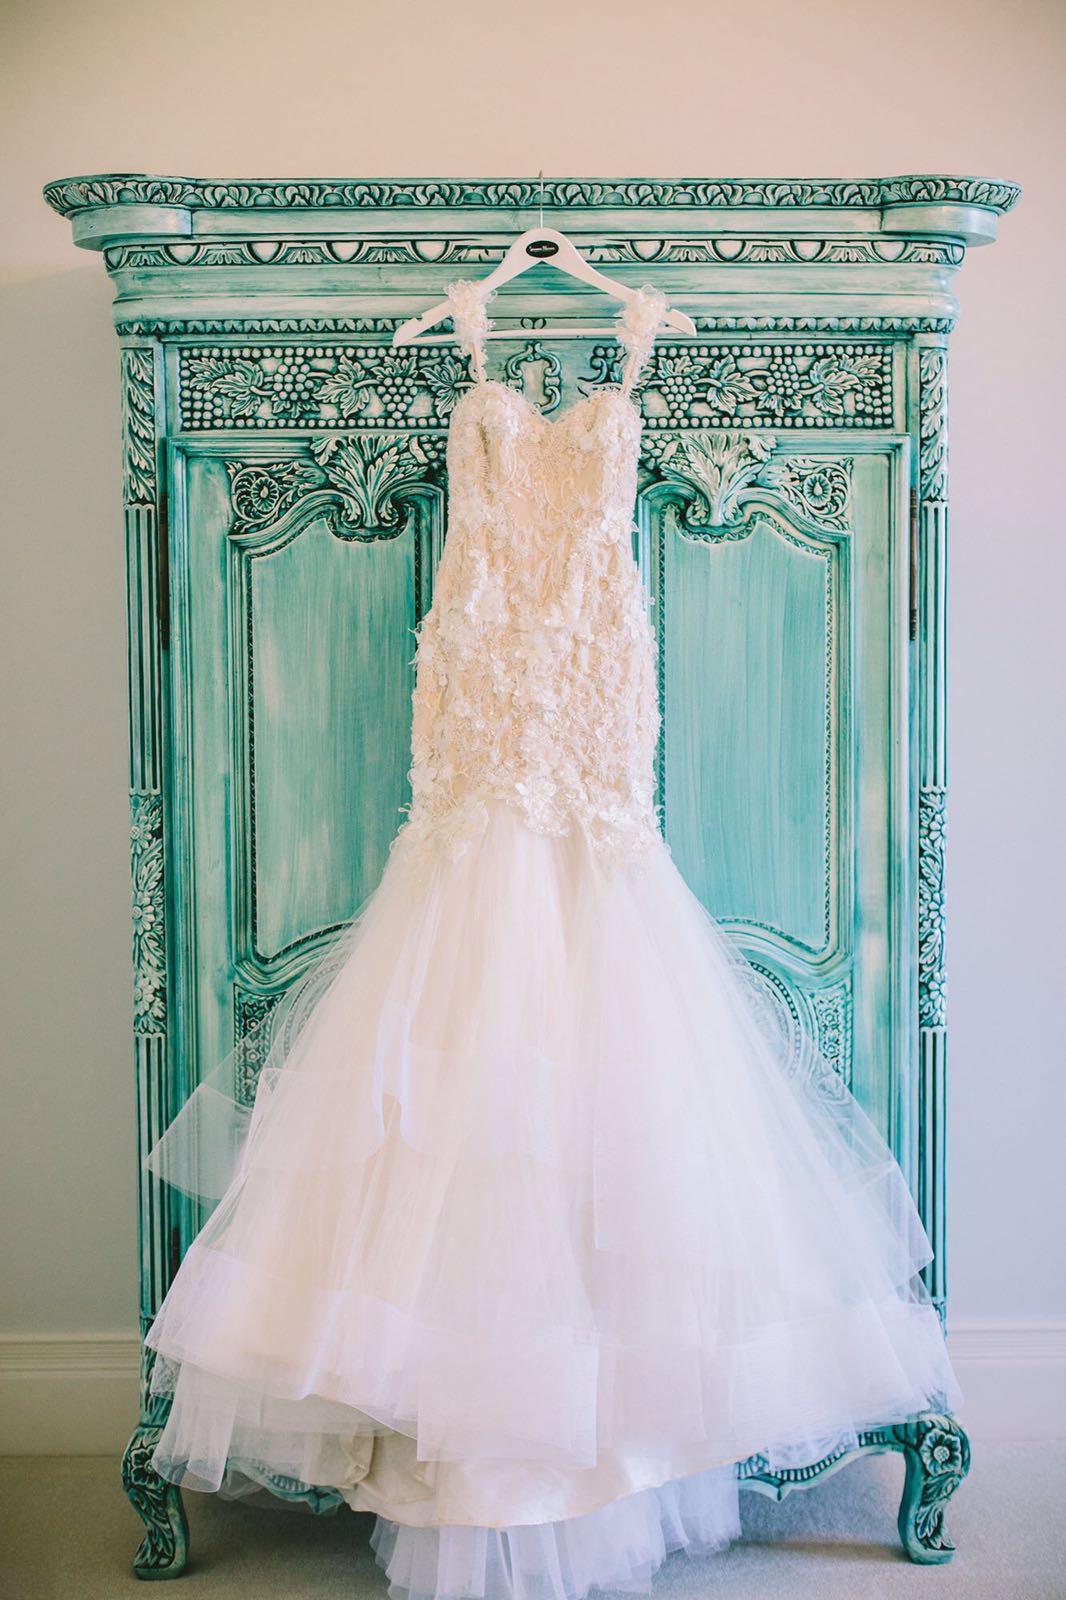 Enchanting J Aton Wedding Gowns Crest - All Wedding Dresses ...